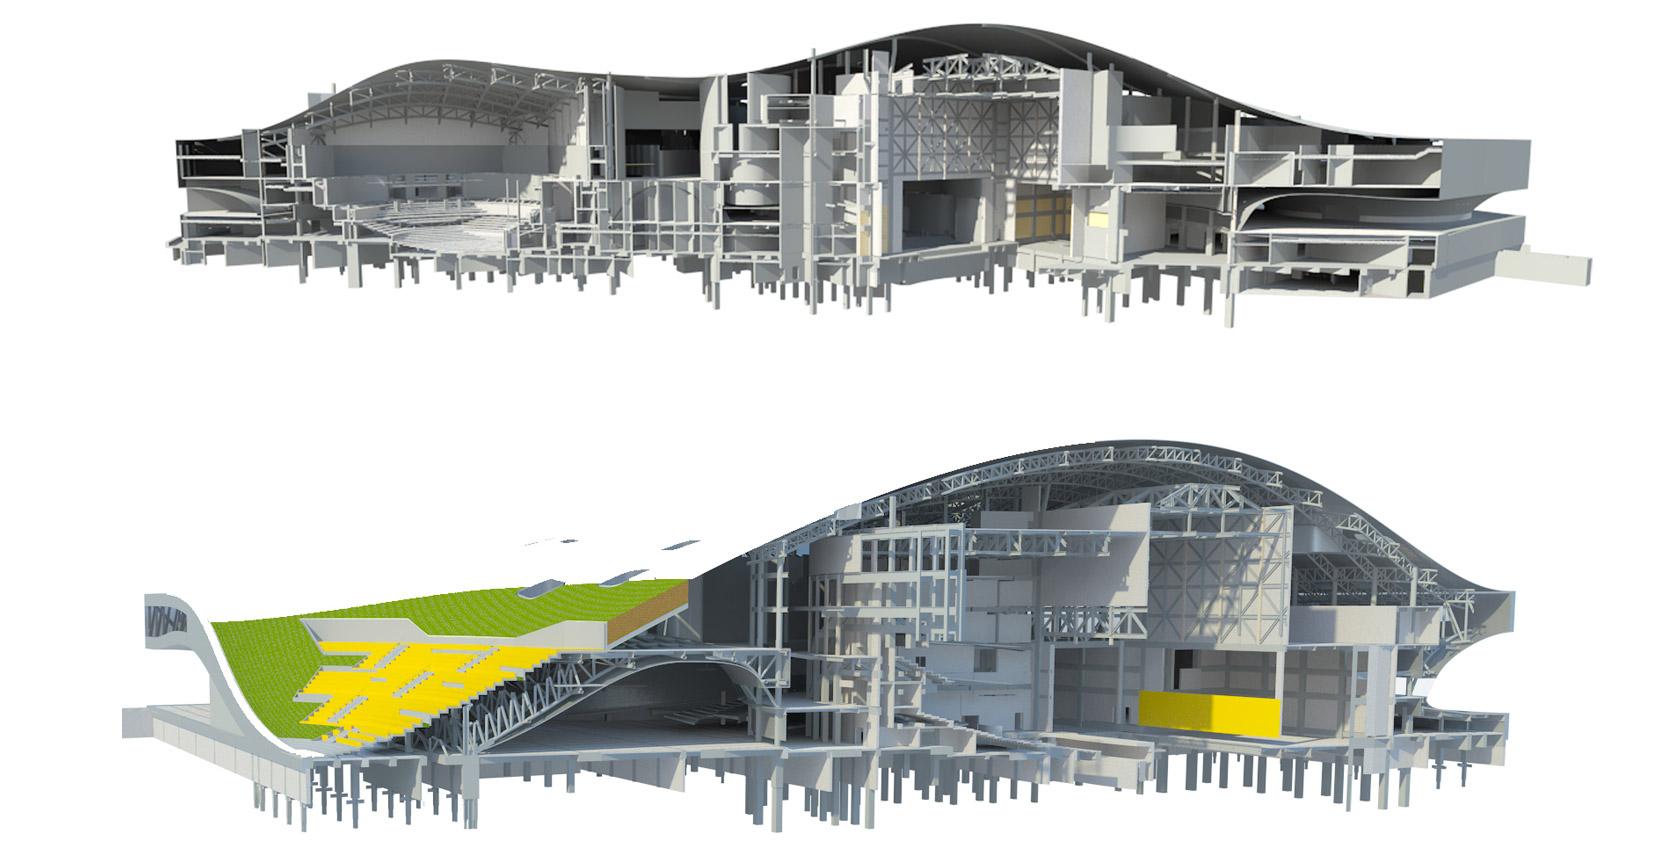 Curso de Modelado 3D con Autodesk REVIT